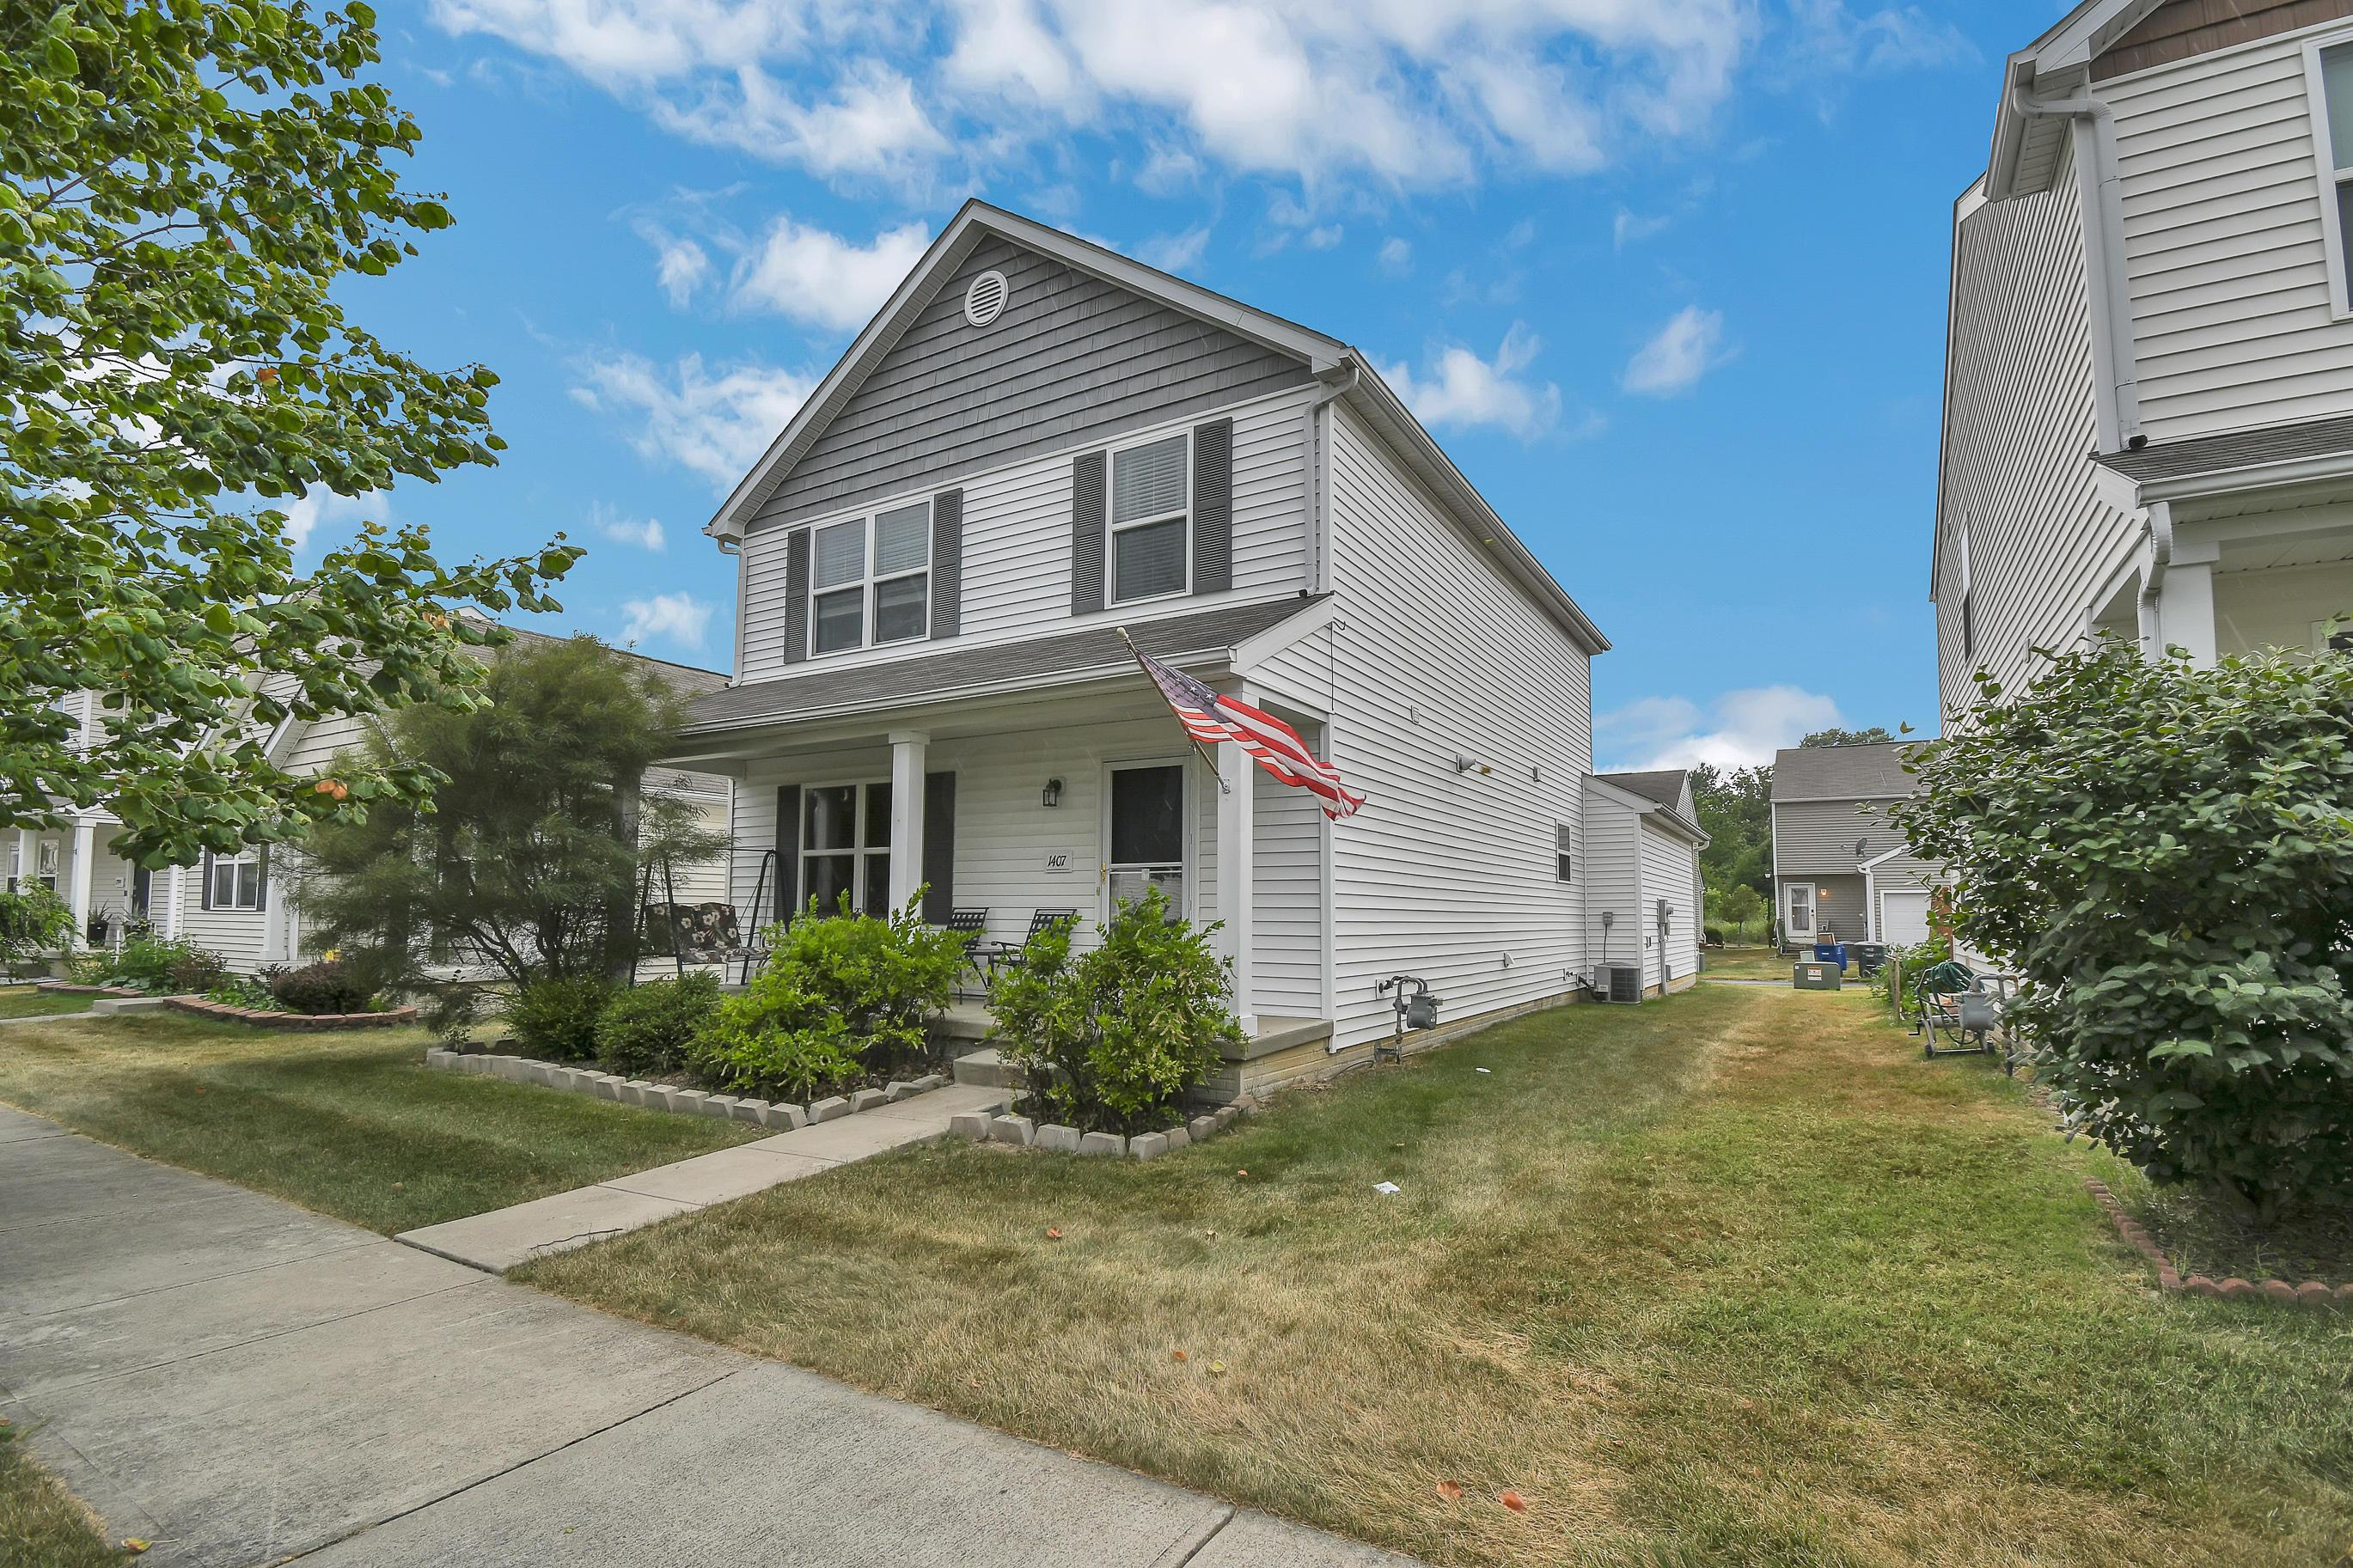 1407 Ithaca Drive, Columbus, Ohio 43228, 3 Bedrooms Bedrooms, ,3 BathroomsBathrooms,Residential,For Sale,Ithaca,220022257